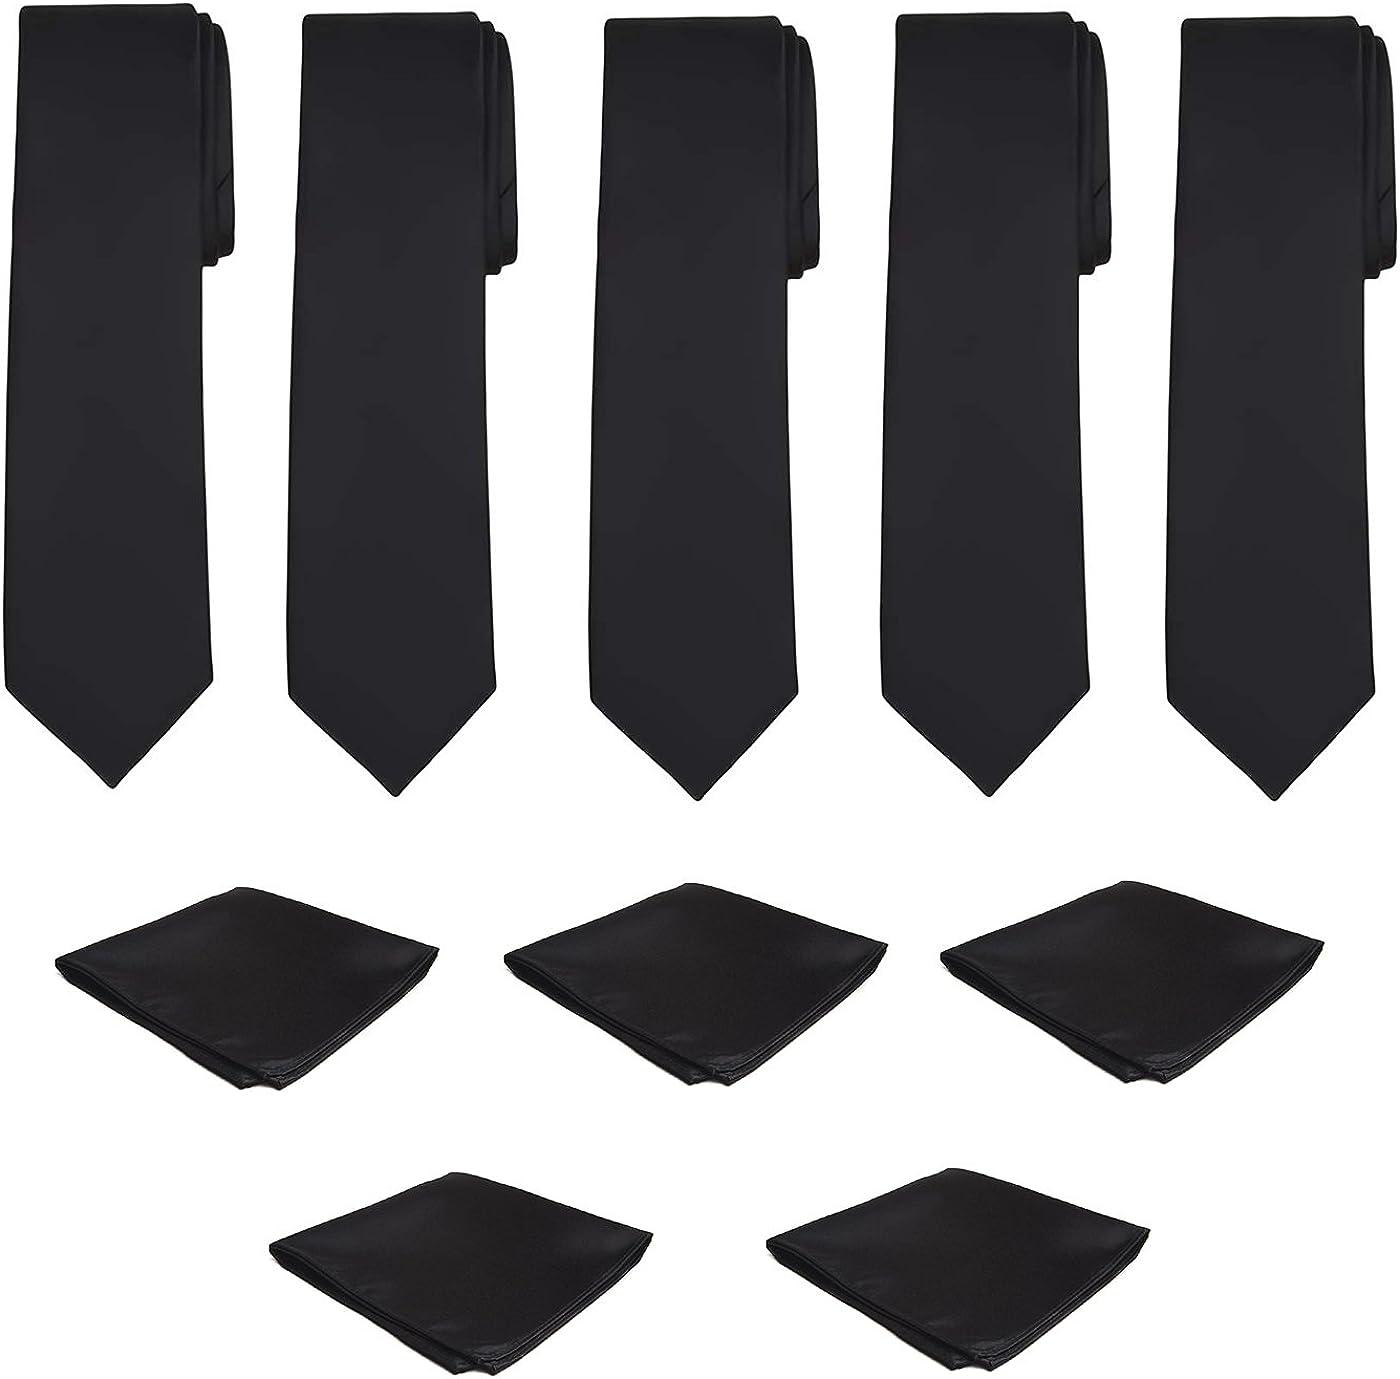 Mens Necktie Pocket Square 10 Pcs Set Solid Color Tie and Handkerchief for Wedding